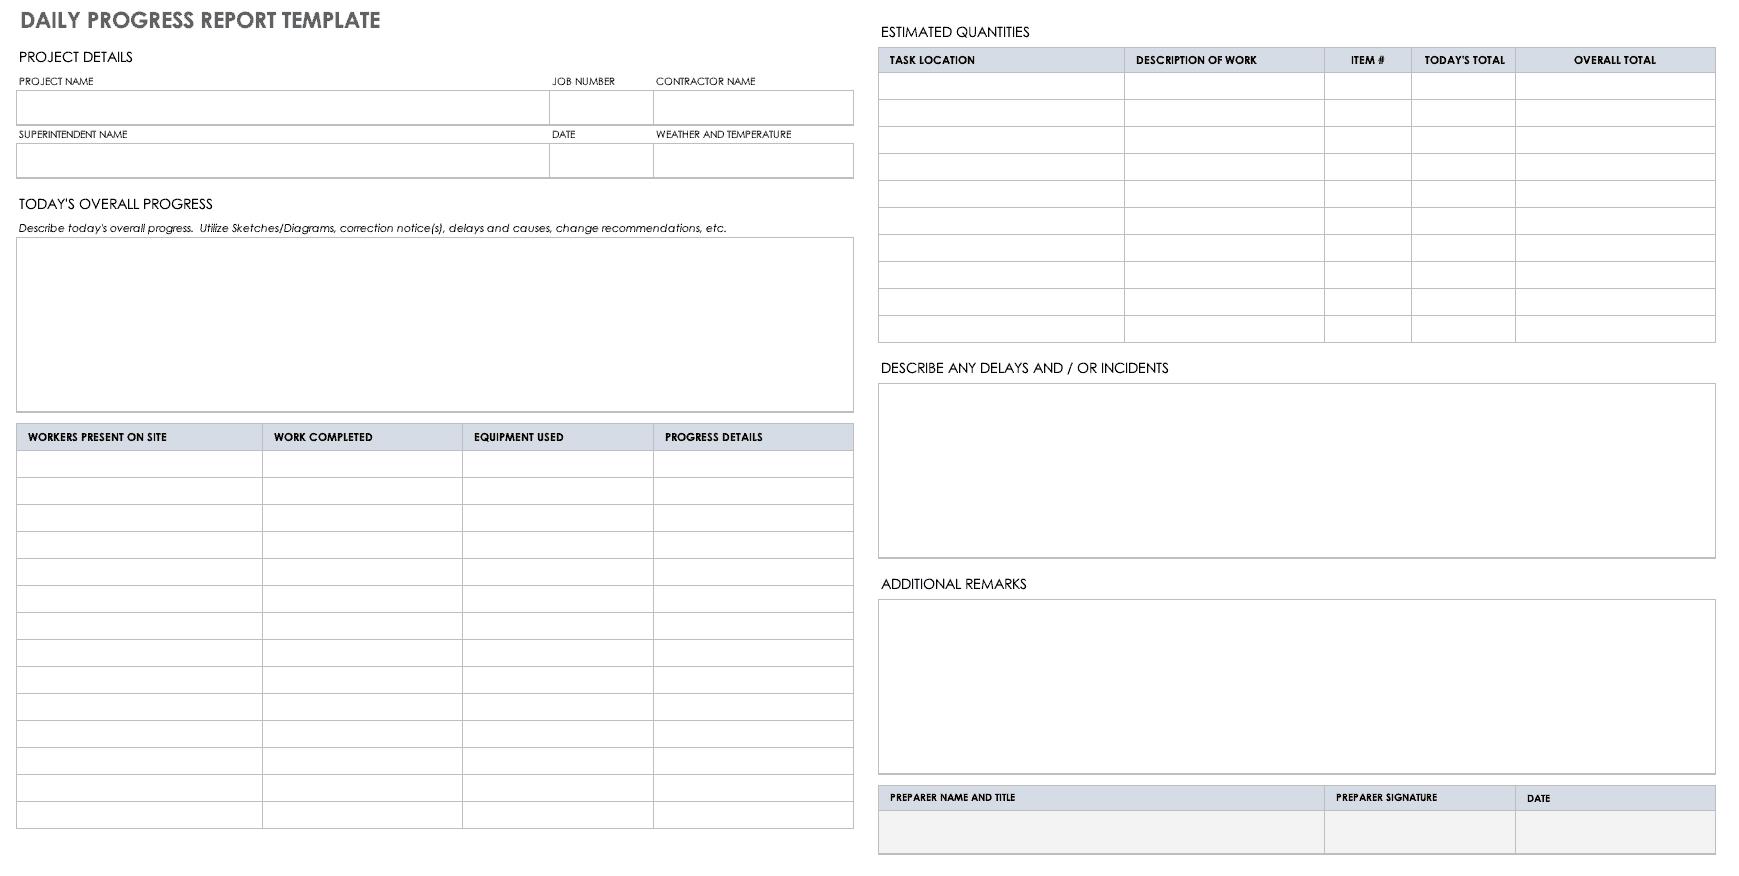 Free Project Report Templates | Smartsheet In Progress Report Template Doc